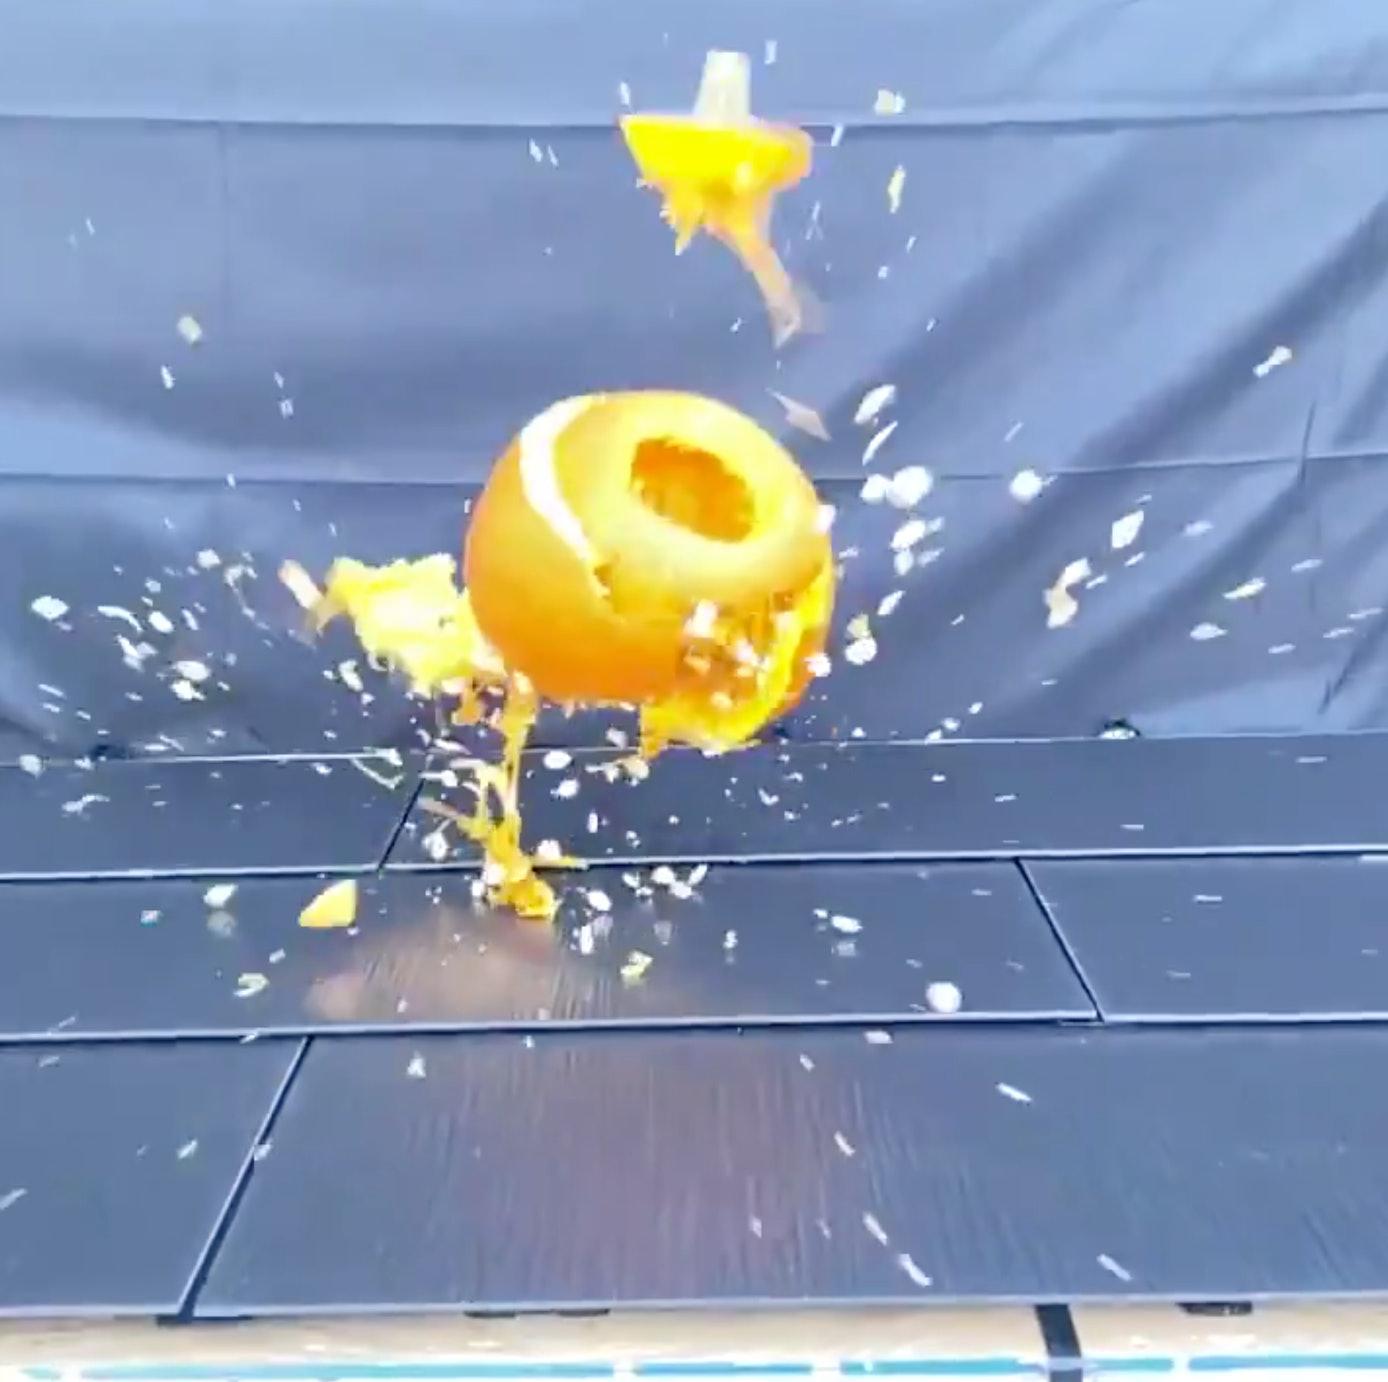 Tesla Solar Roof getting hit by a pumpkin.